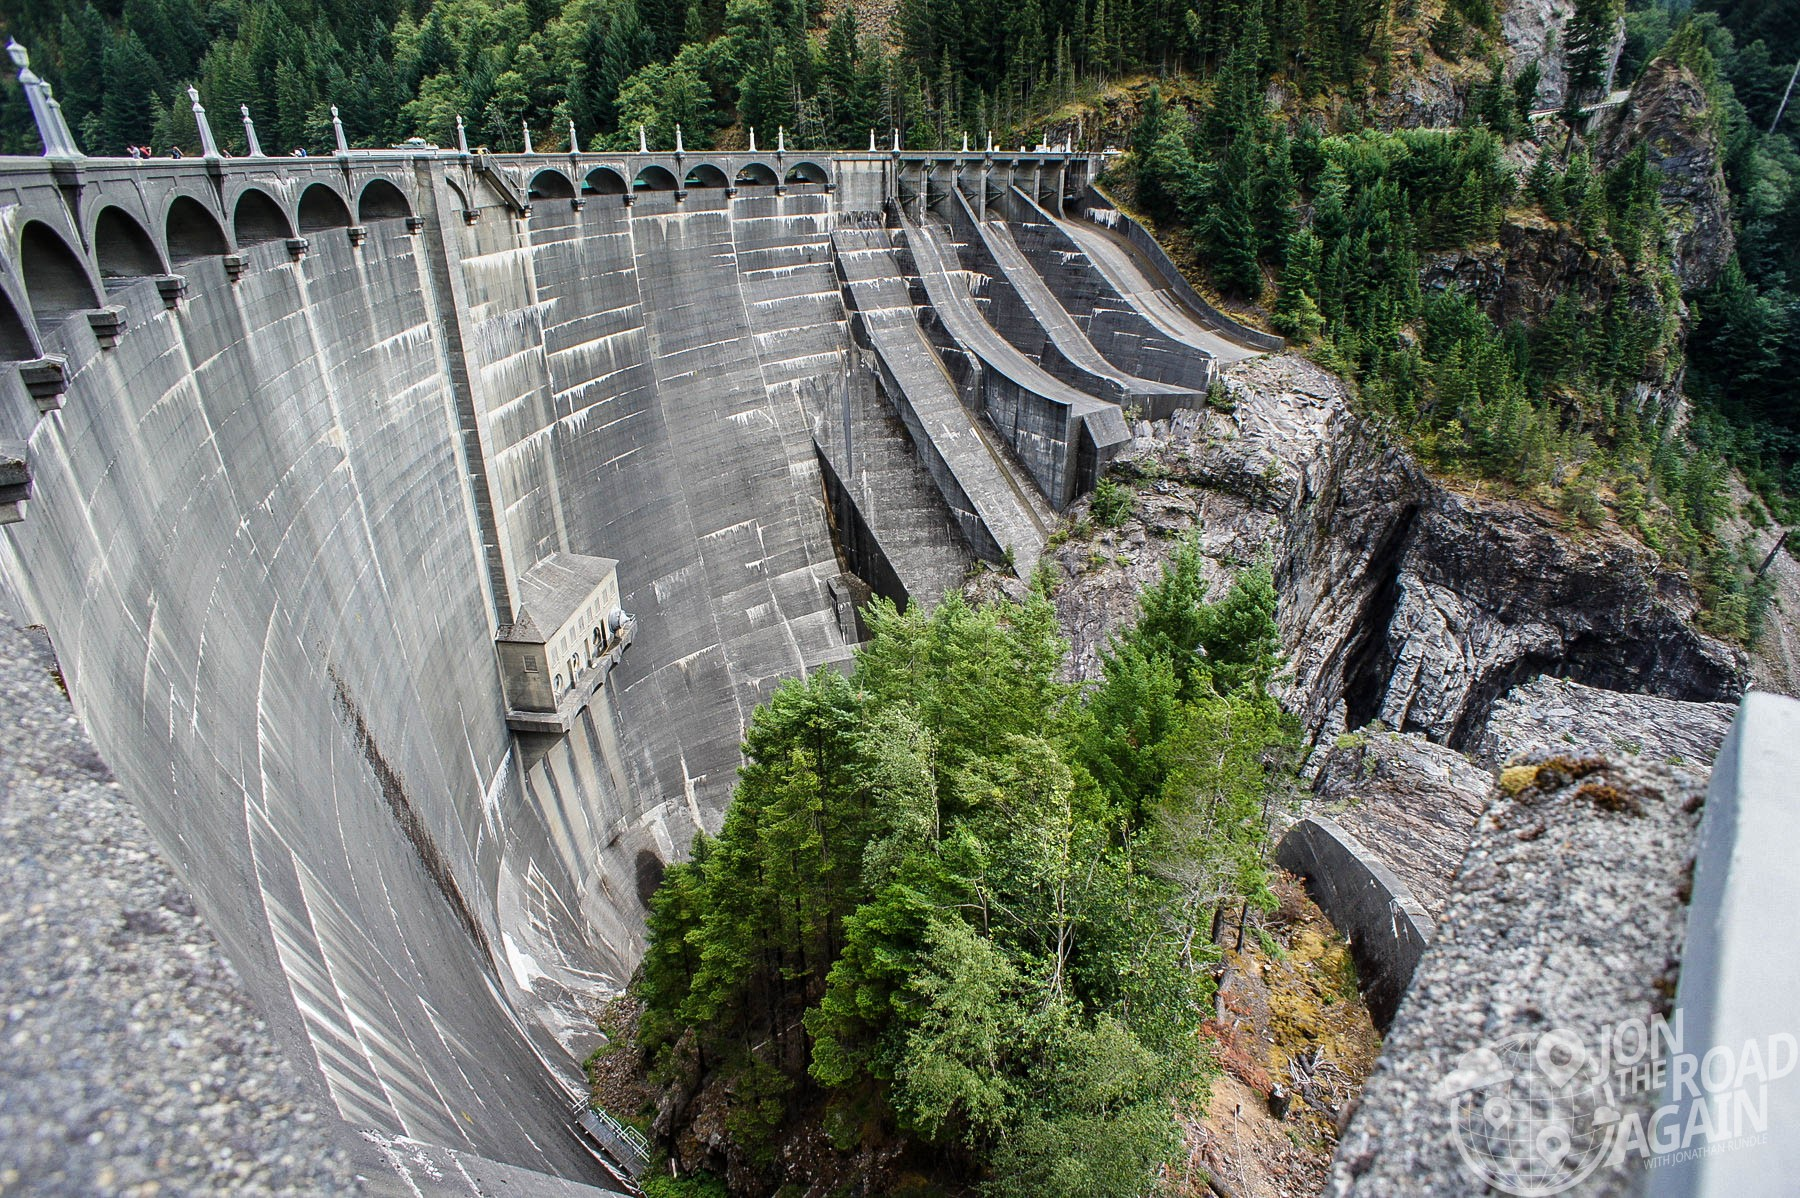 Over the edge at diablo dam